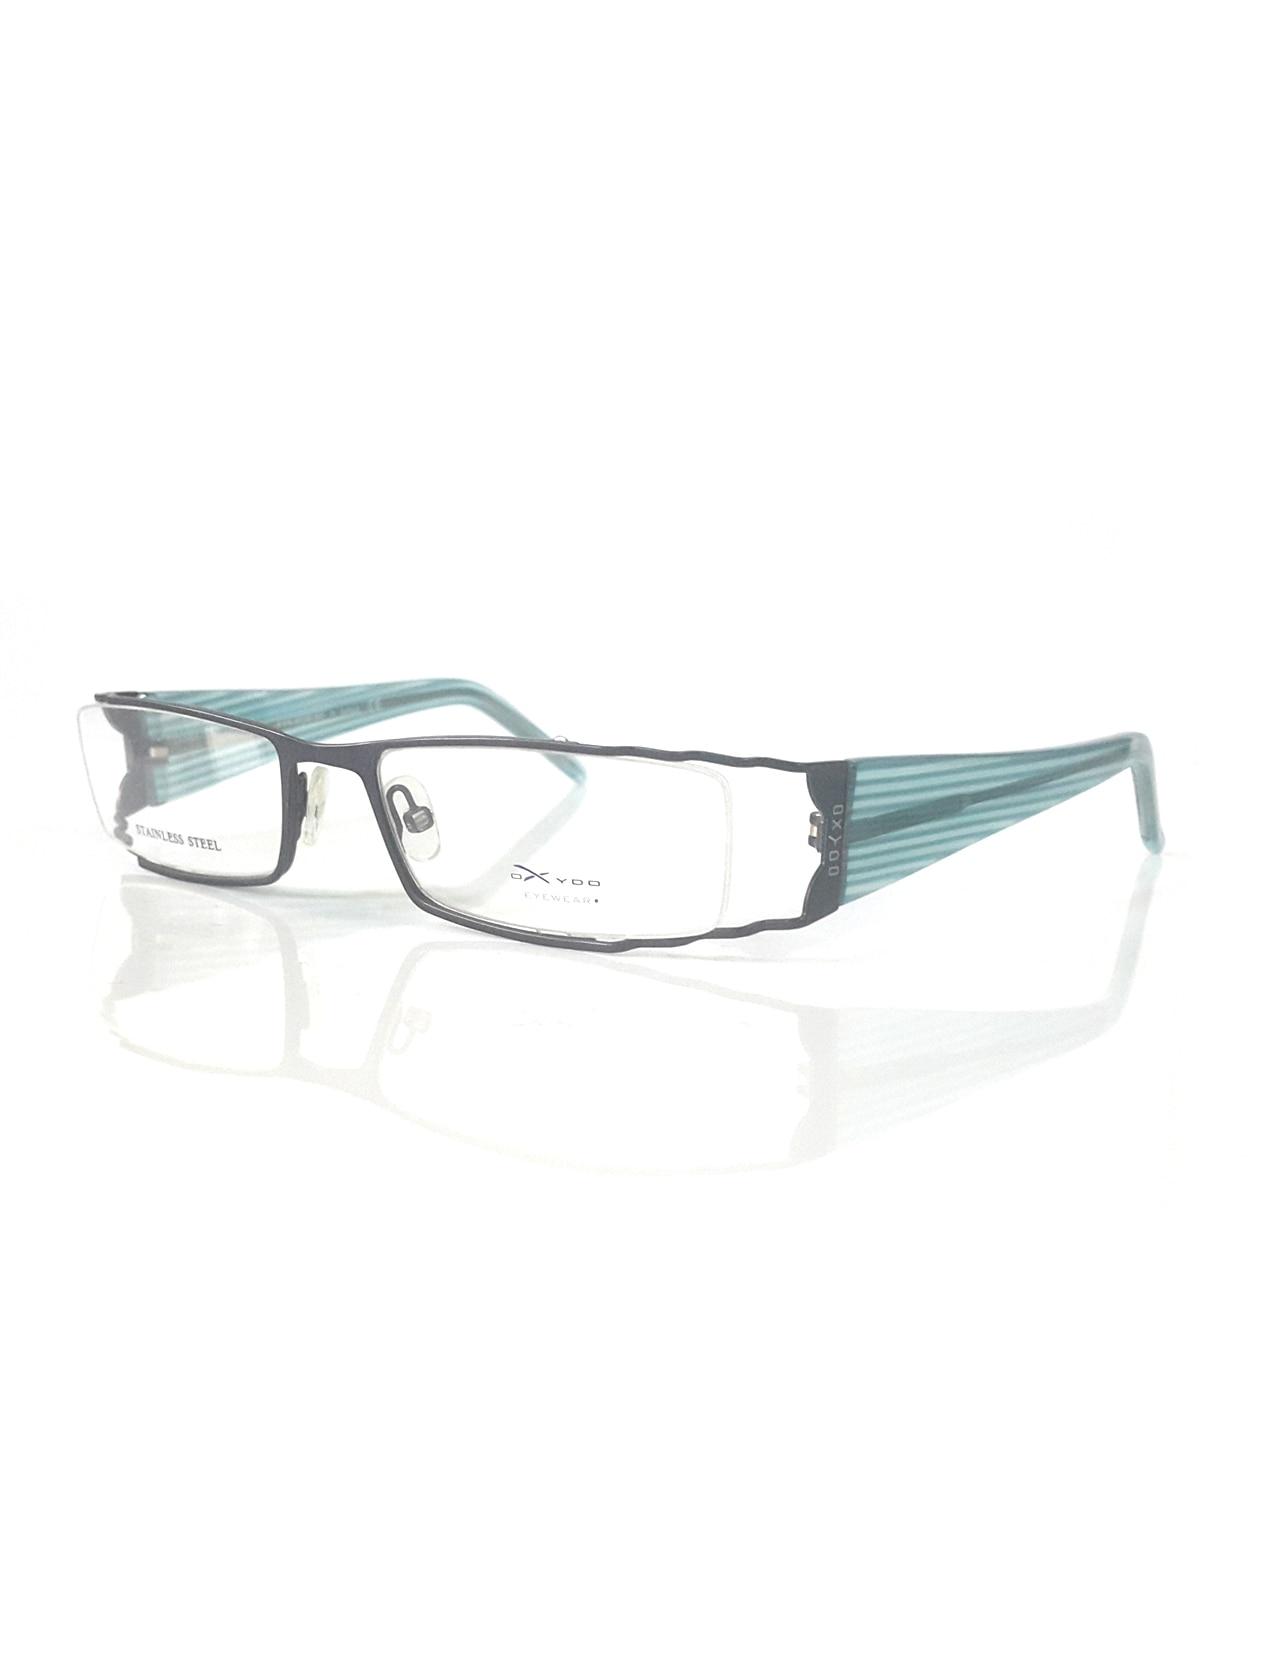 Markamilla Women Reading Glasses Frame Demo Glasses Eyewear Transparent High Quality WomenOxydo OX 313 PIB 51 18